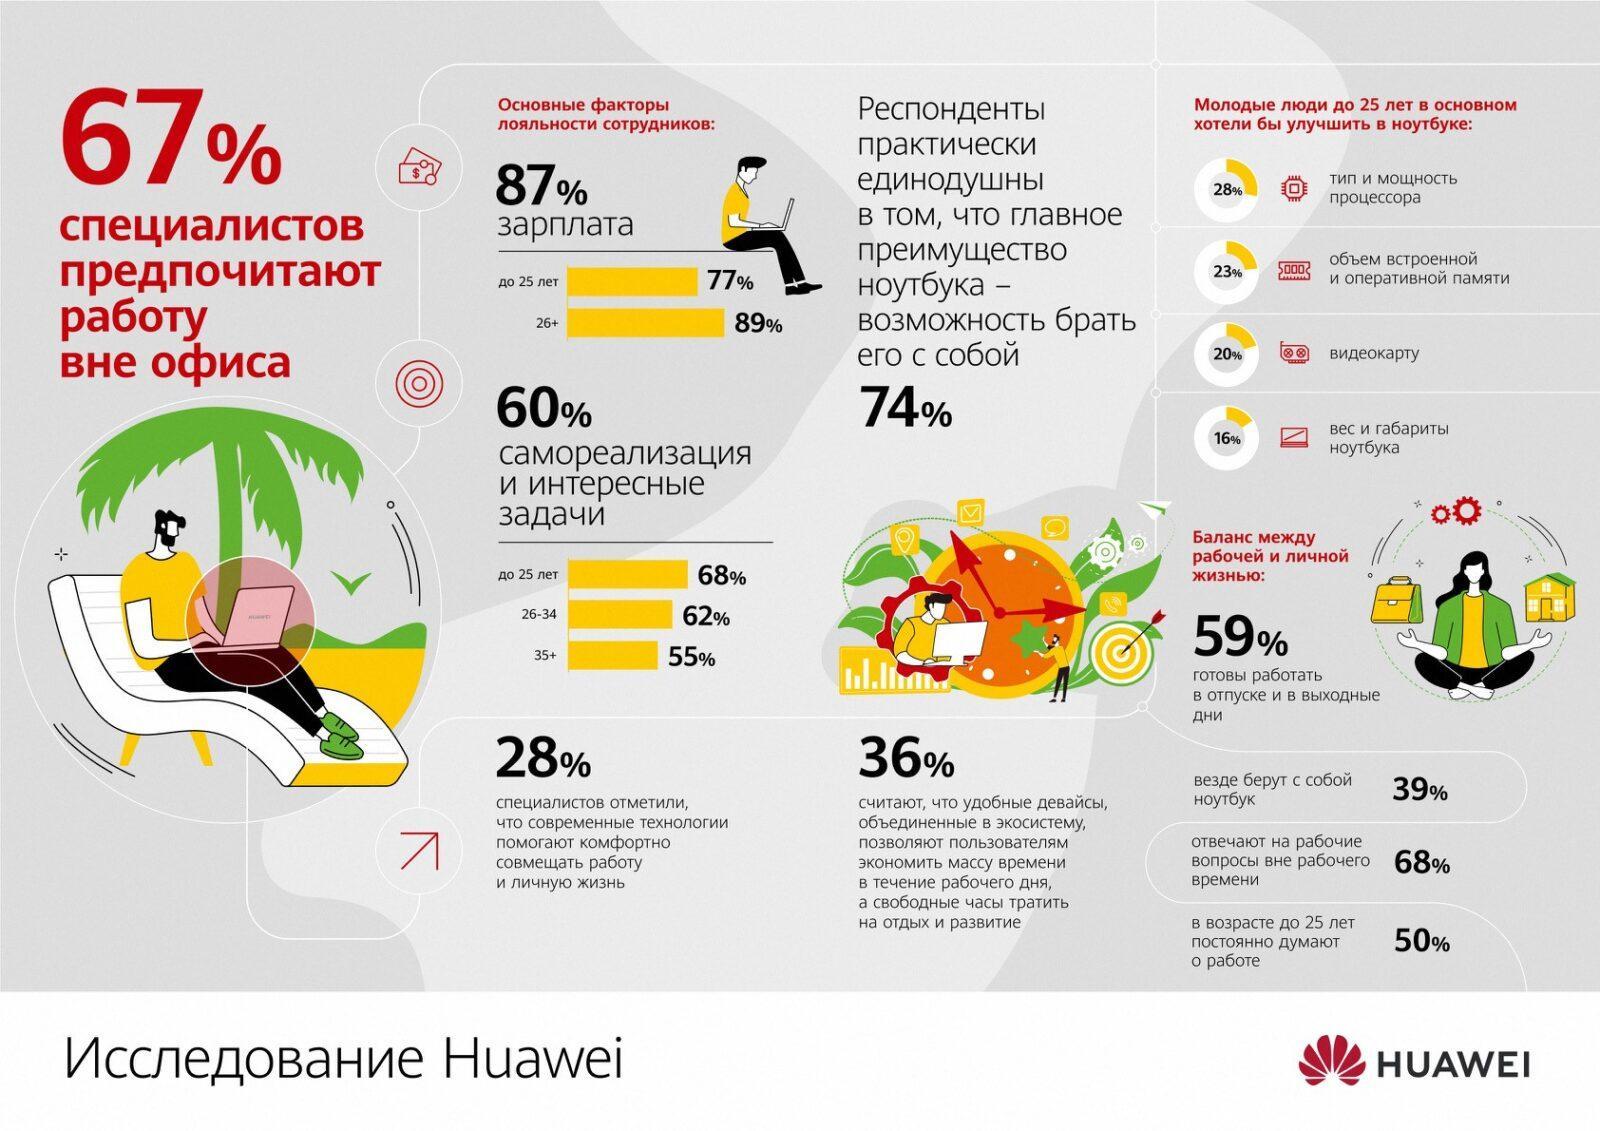 По данным Huawei 67% людей хотят работать вне офиса (issledovanie huawei)